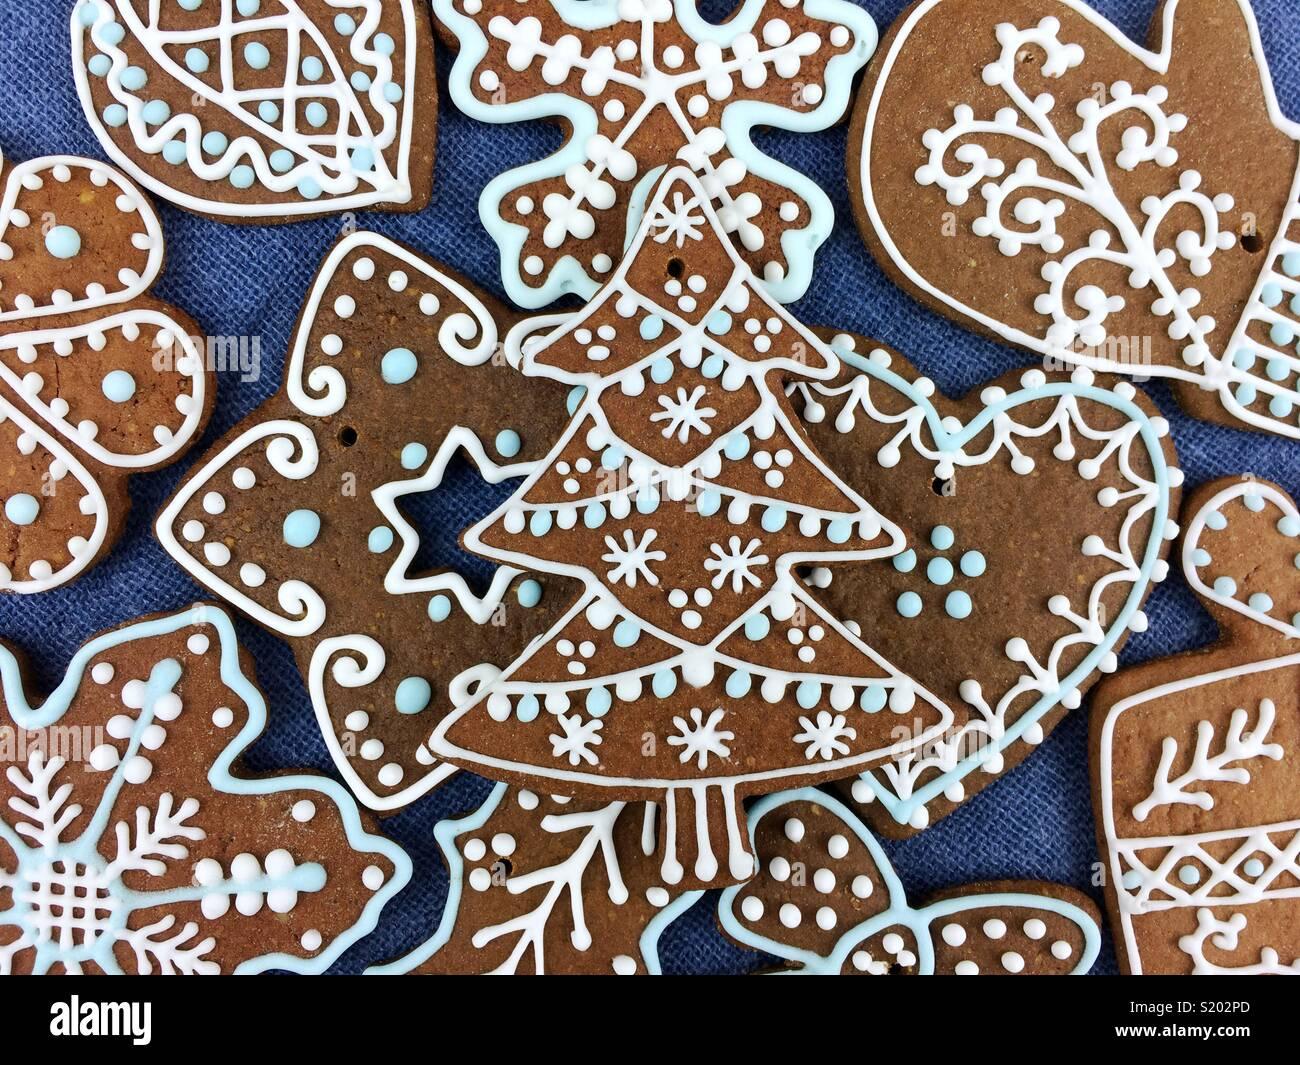 Décoration de Noël gingerbread cookies Photo Stock